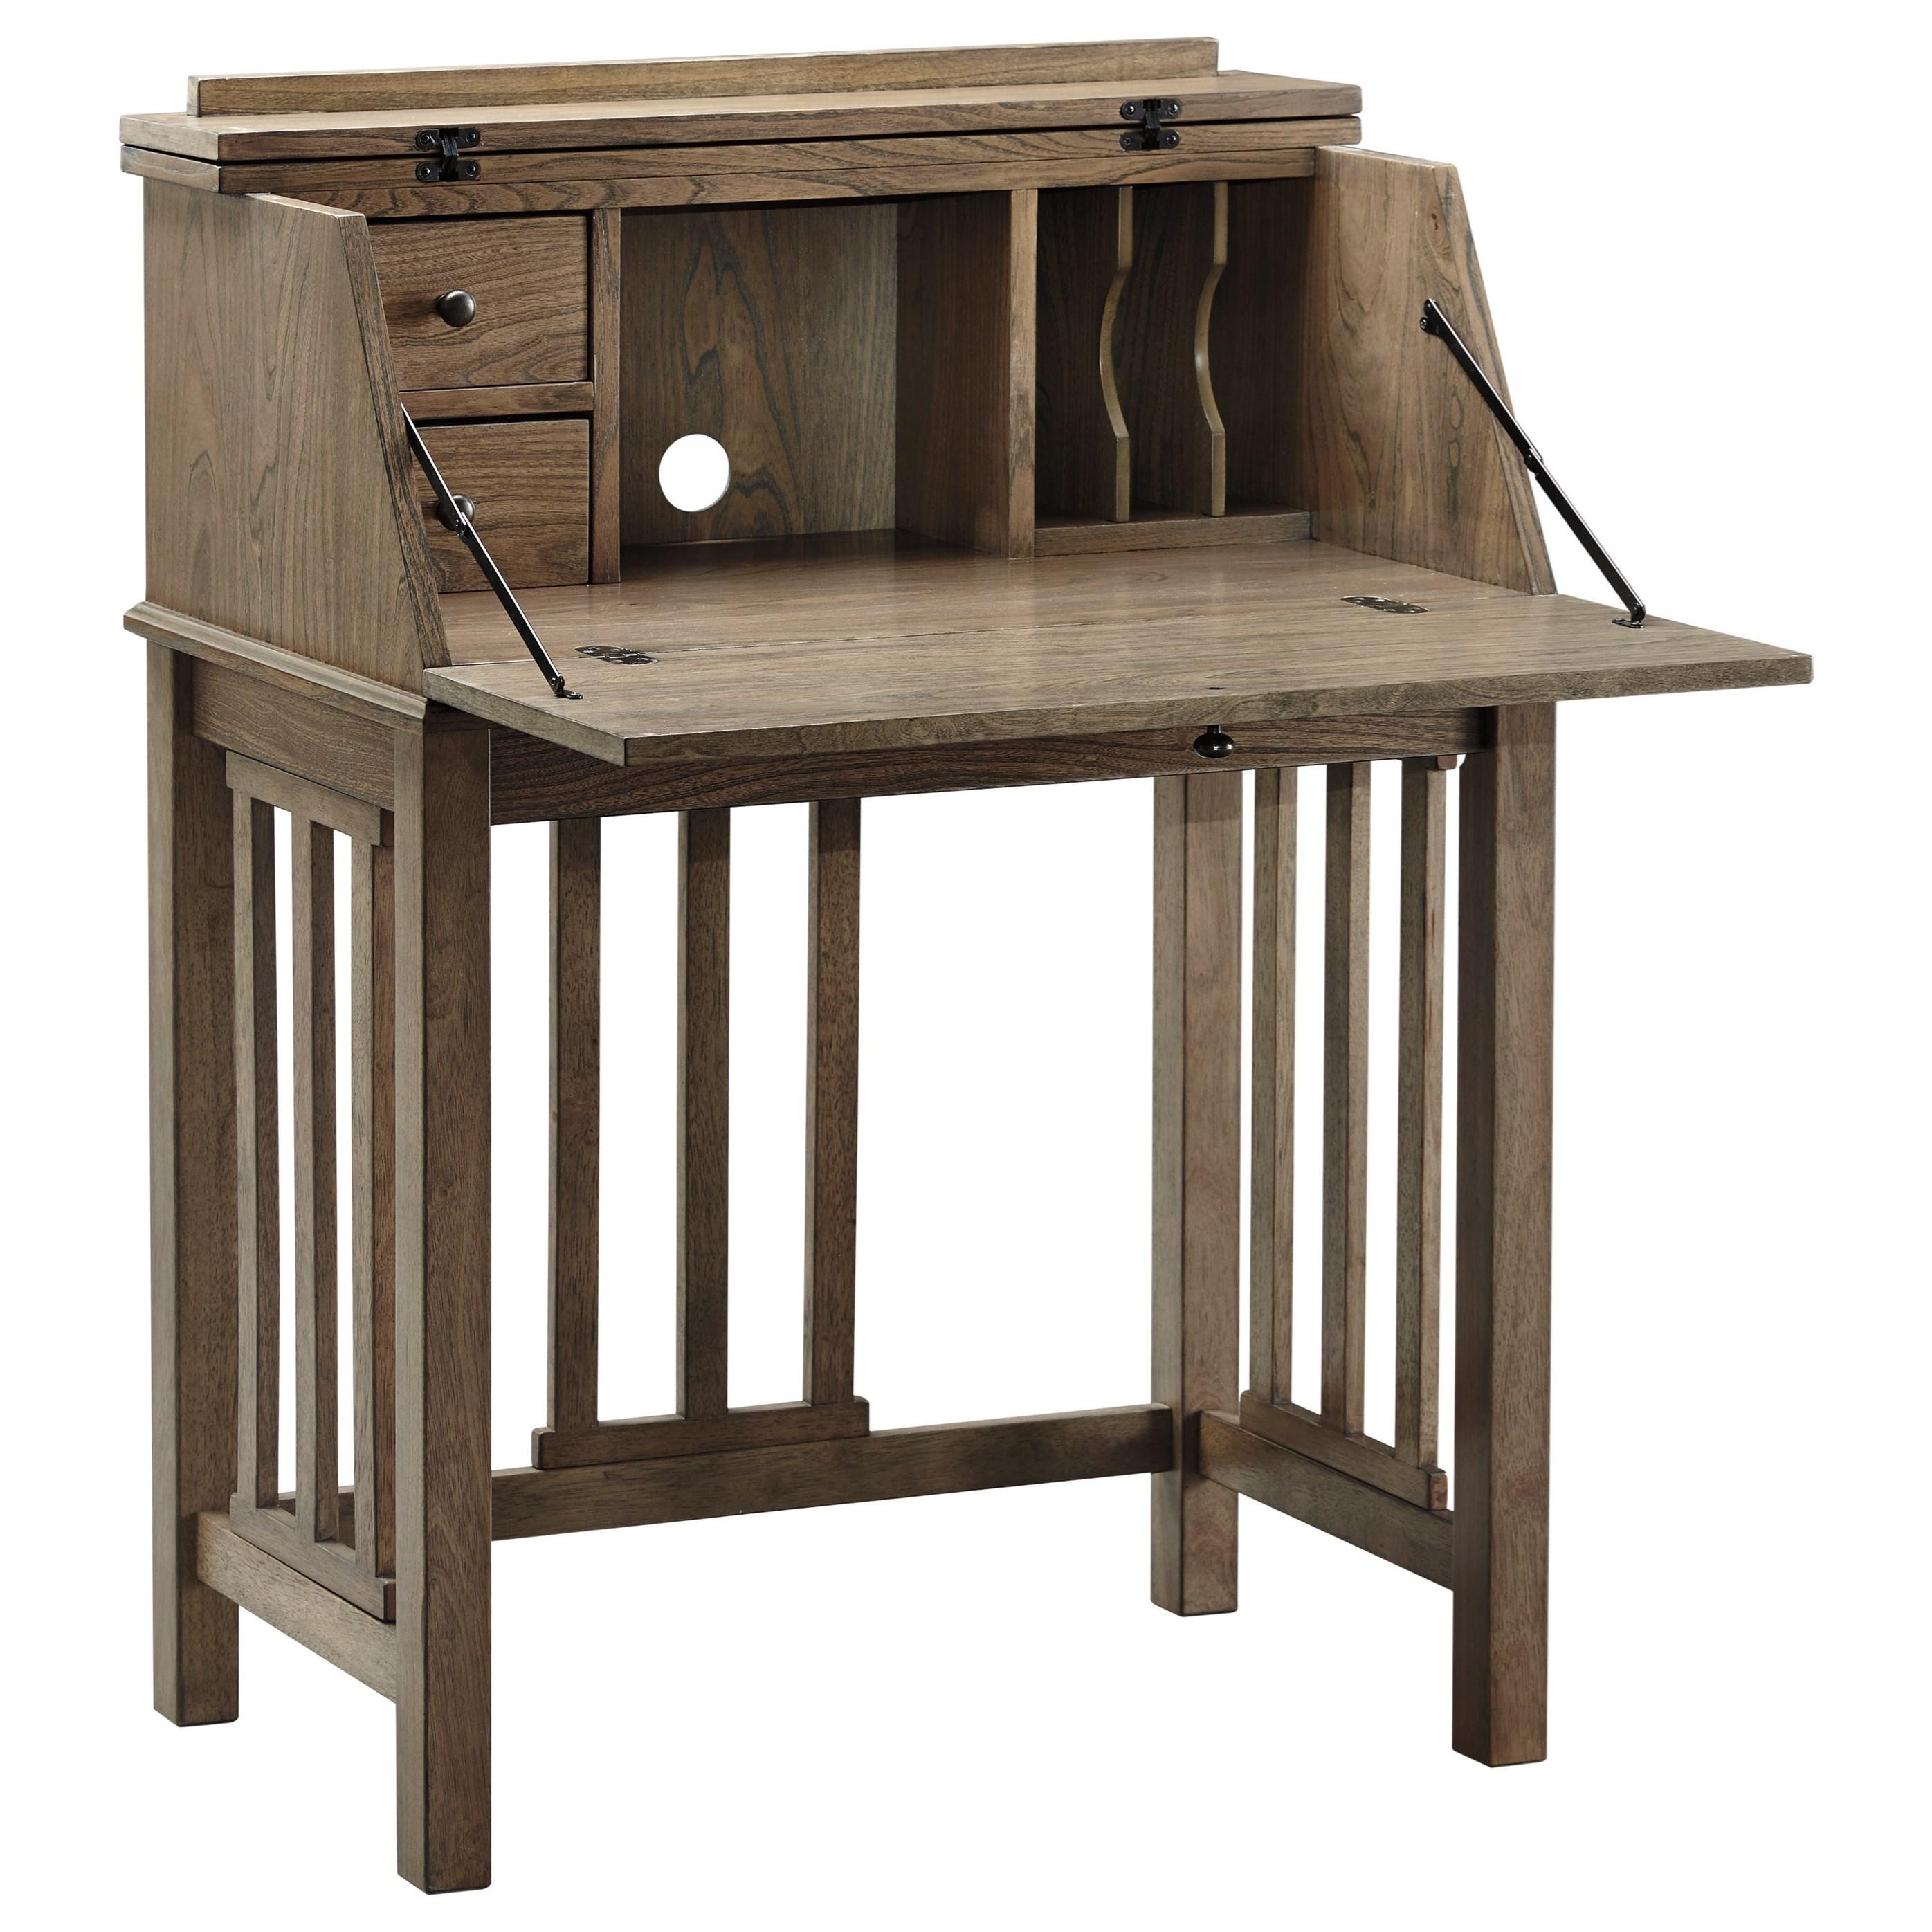 Ashley Signature Design Dexifield H209 19 Secretary Home Office Drop Front Desk Dunk Bright